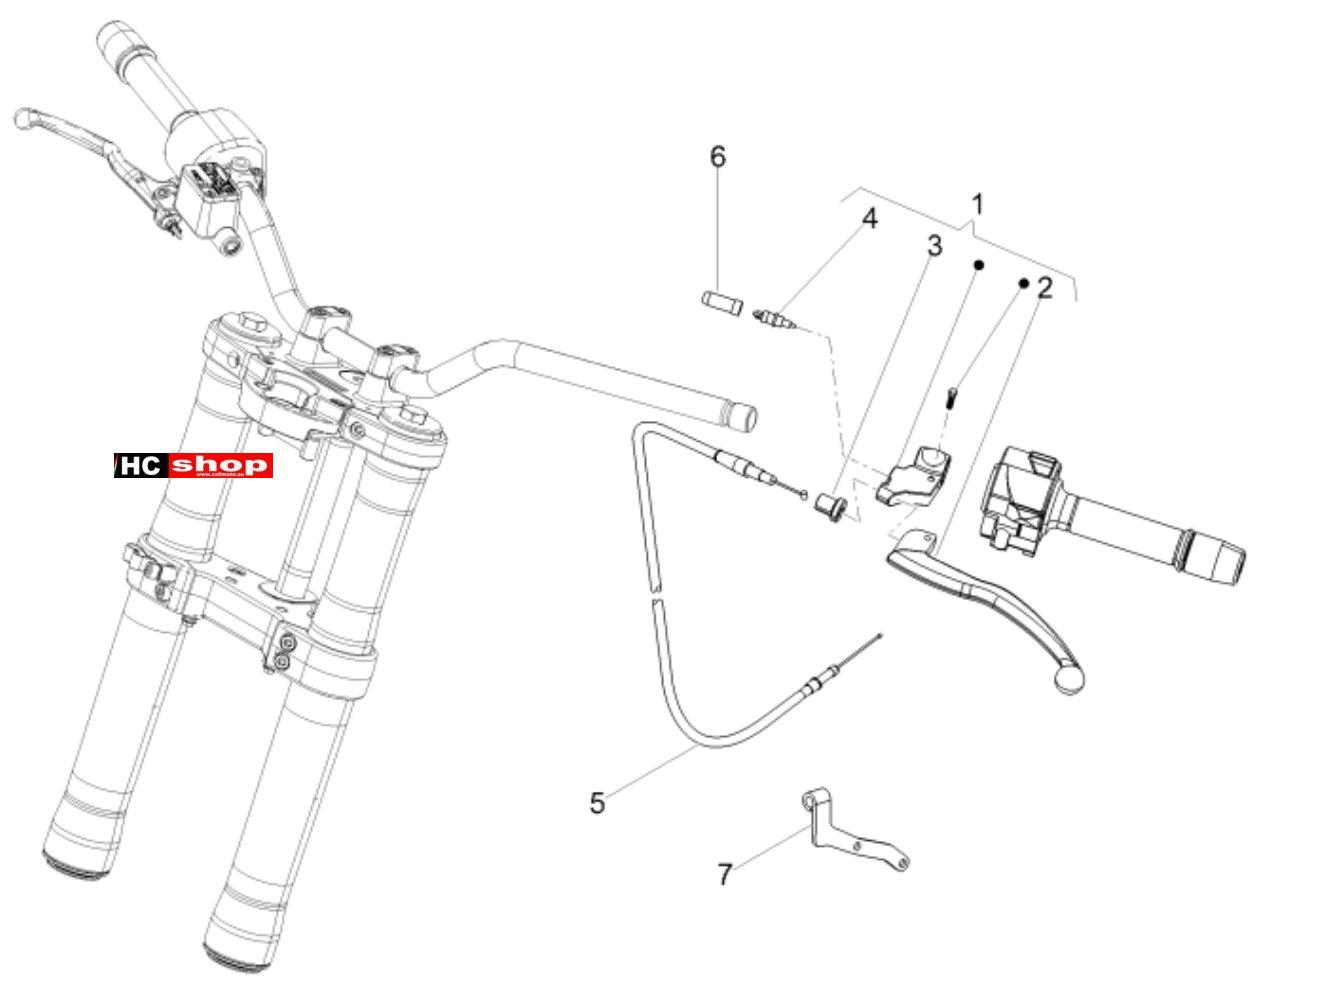 Aprilia Tuono 125 4T E4 ABS Lenker Kupplungssteuerung